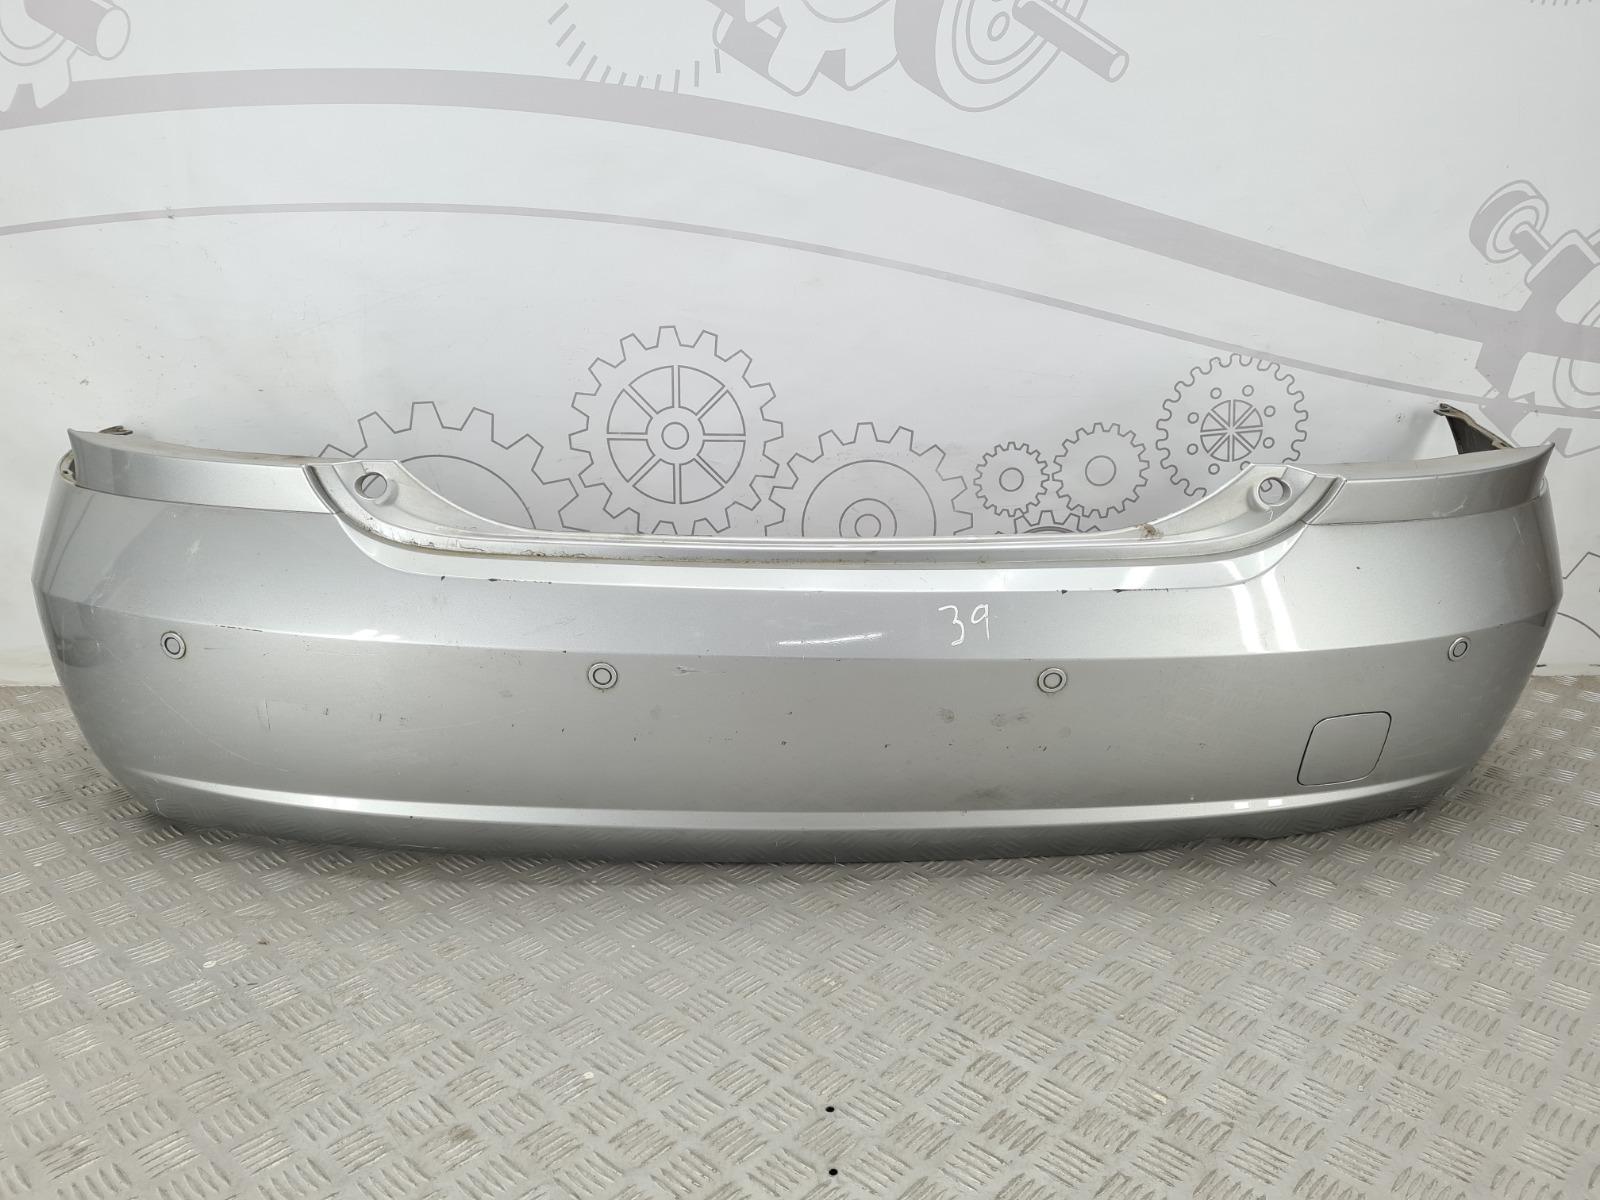 Бампер задний Nissan Almera N16 1.5 I 2004 (б/у)